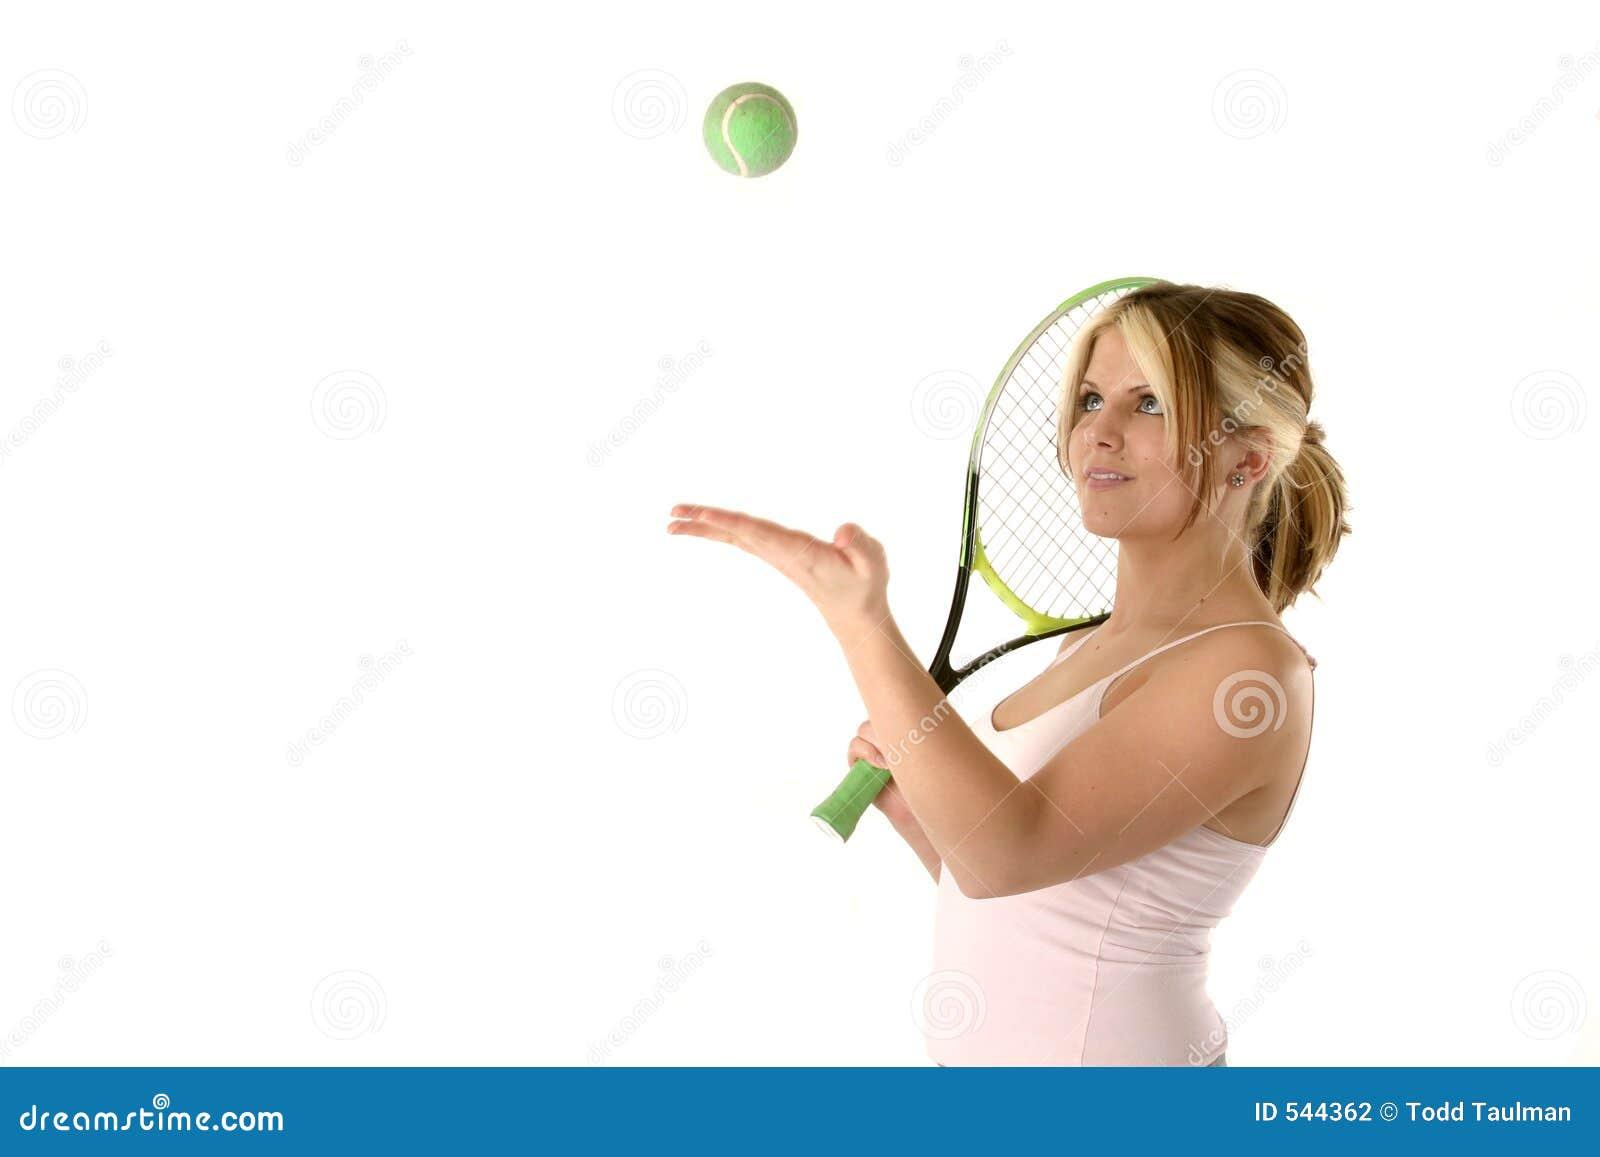 Download 女性球员网球 库存照片. 图片 包括有 字符串, 体育运动, 球员, 妇女, 网球, 空白, 女性, 女孩, 唯一 - 544362